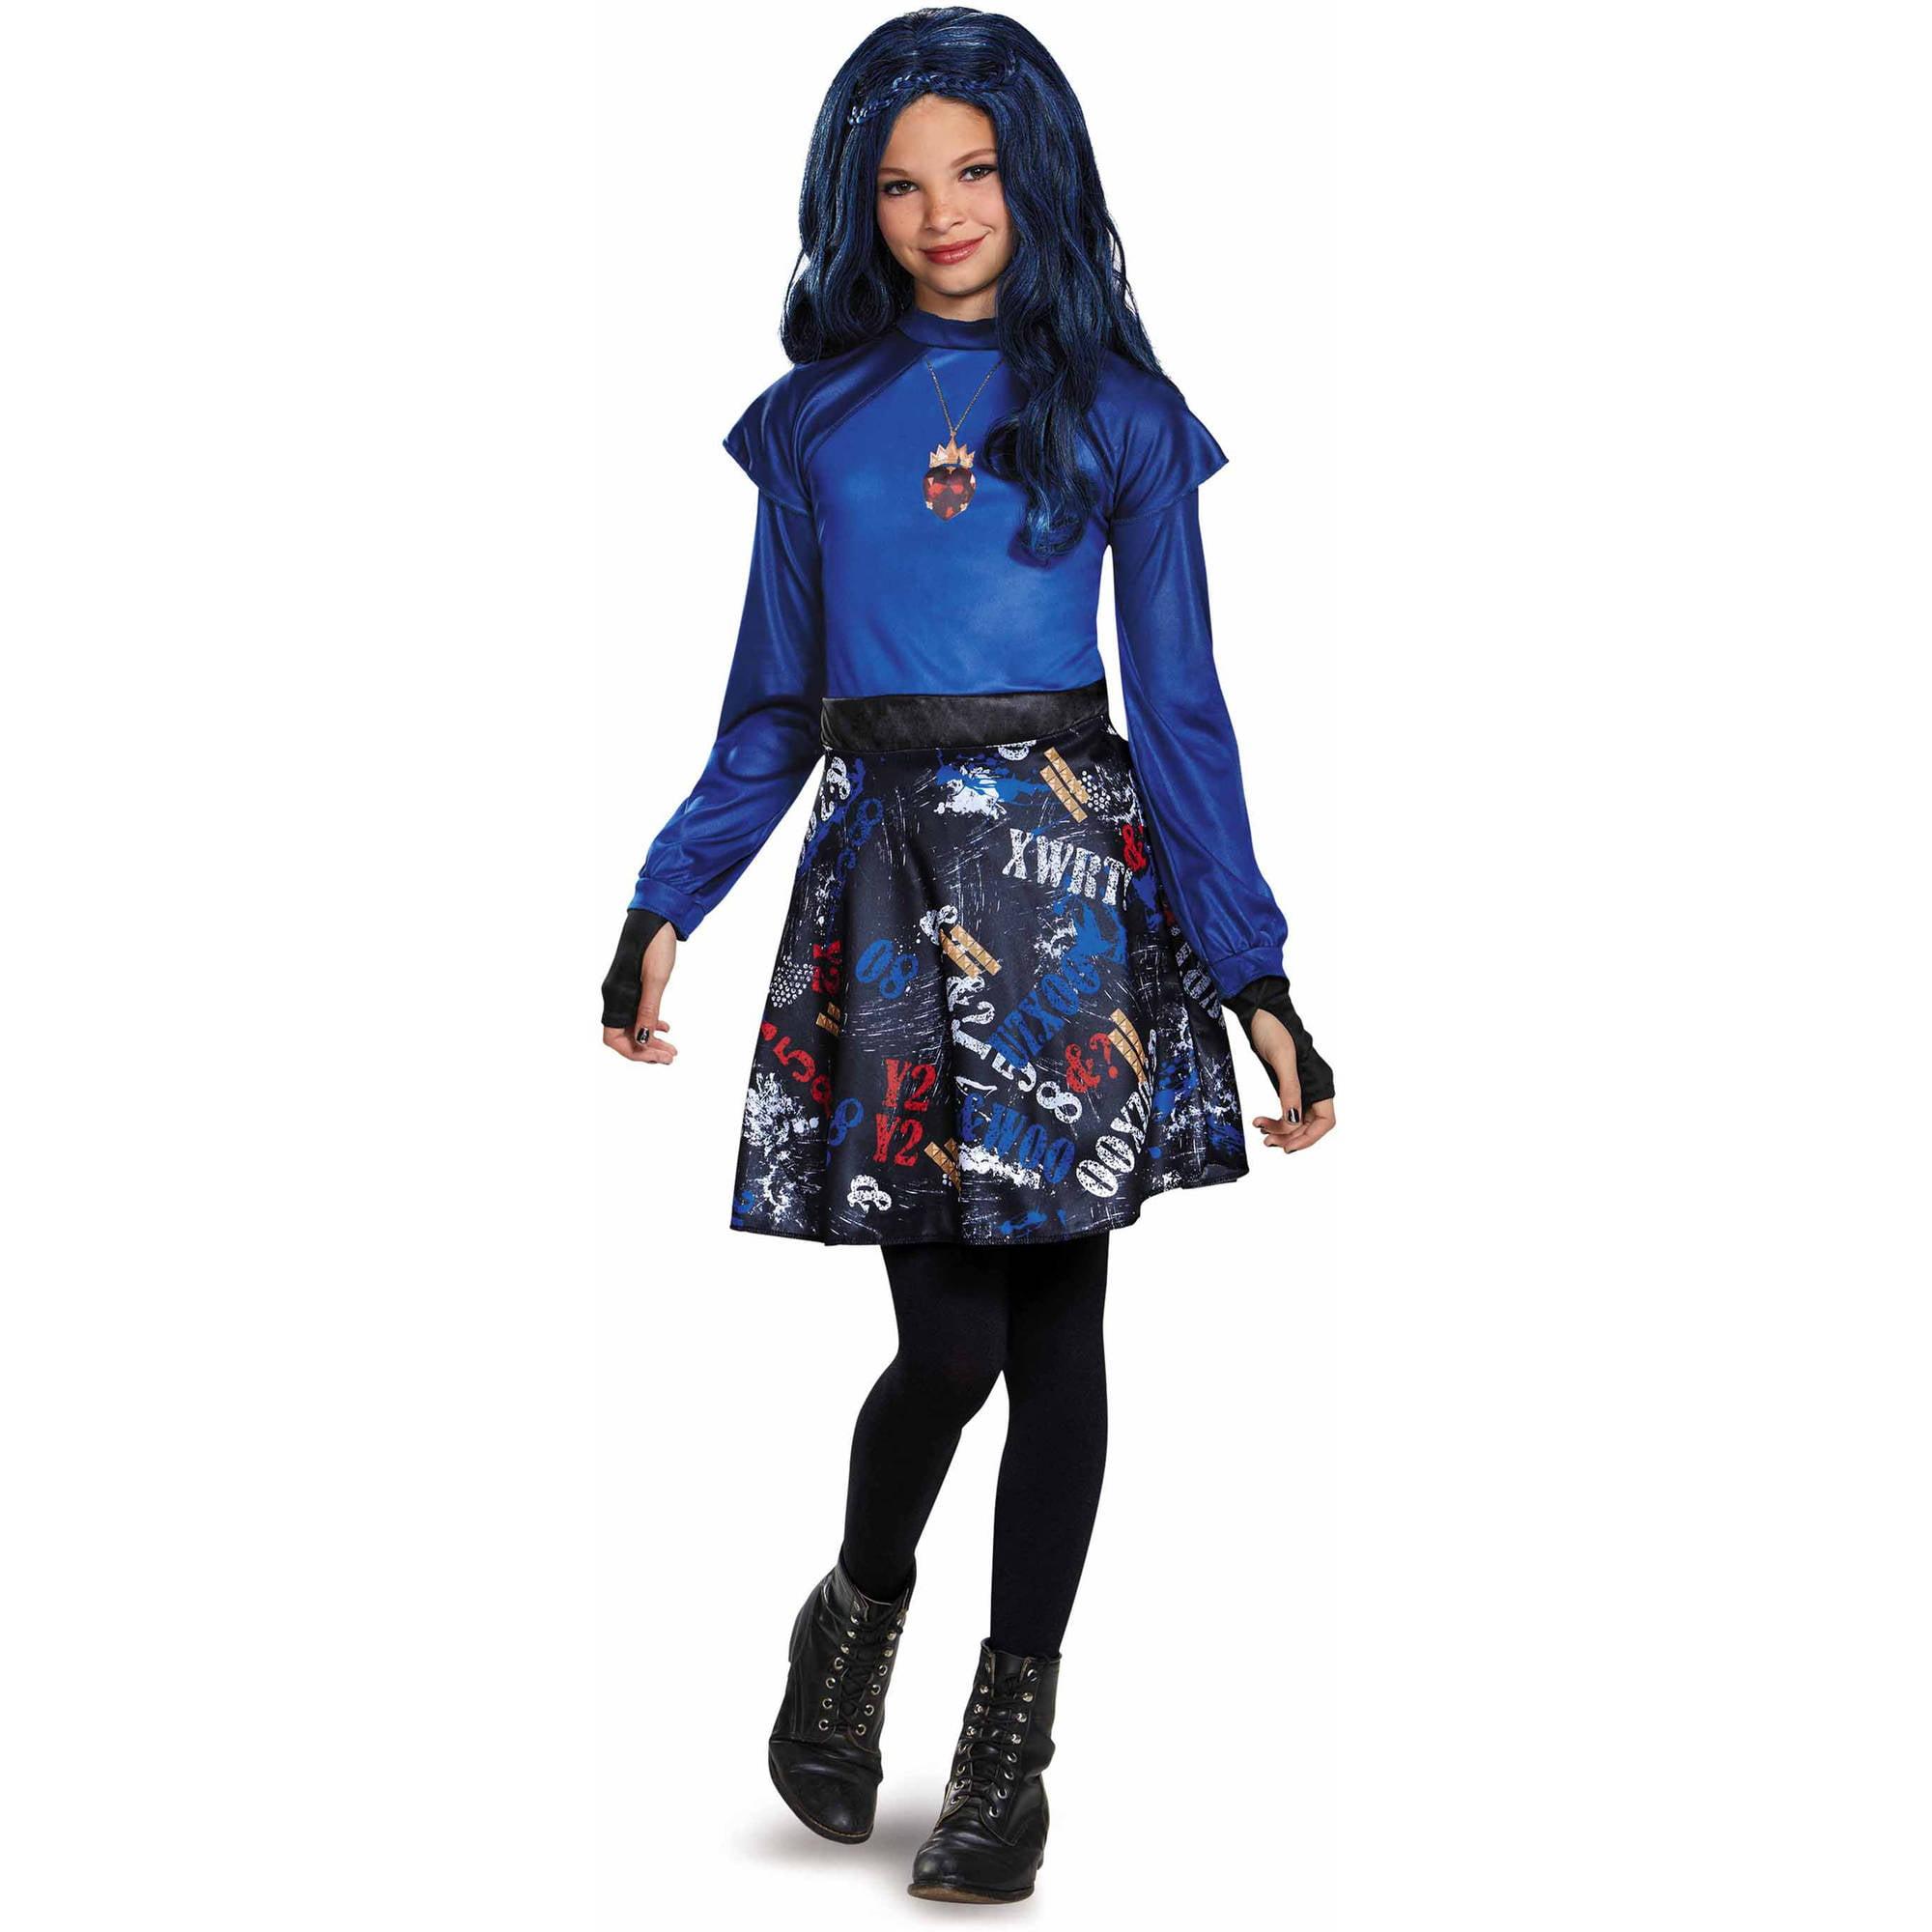 sc 1 st  Walmart & Descendantu0027s Evie Classic Child Halloween Costume - Walmart.com